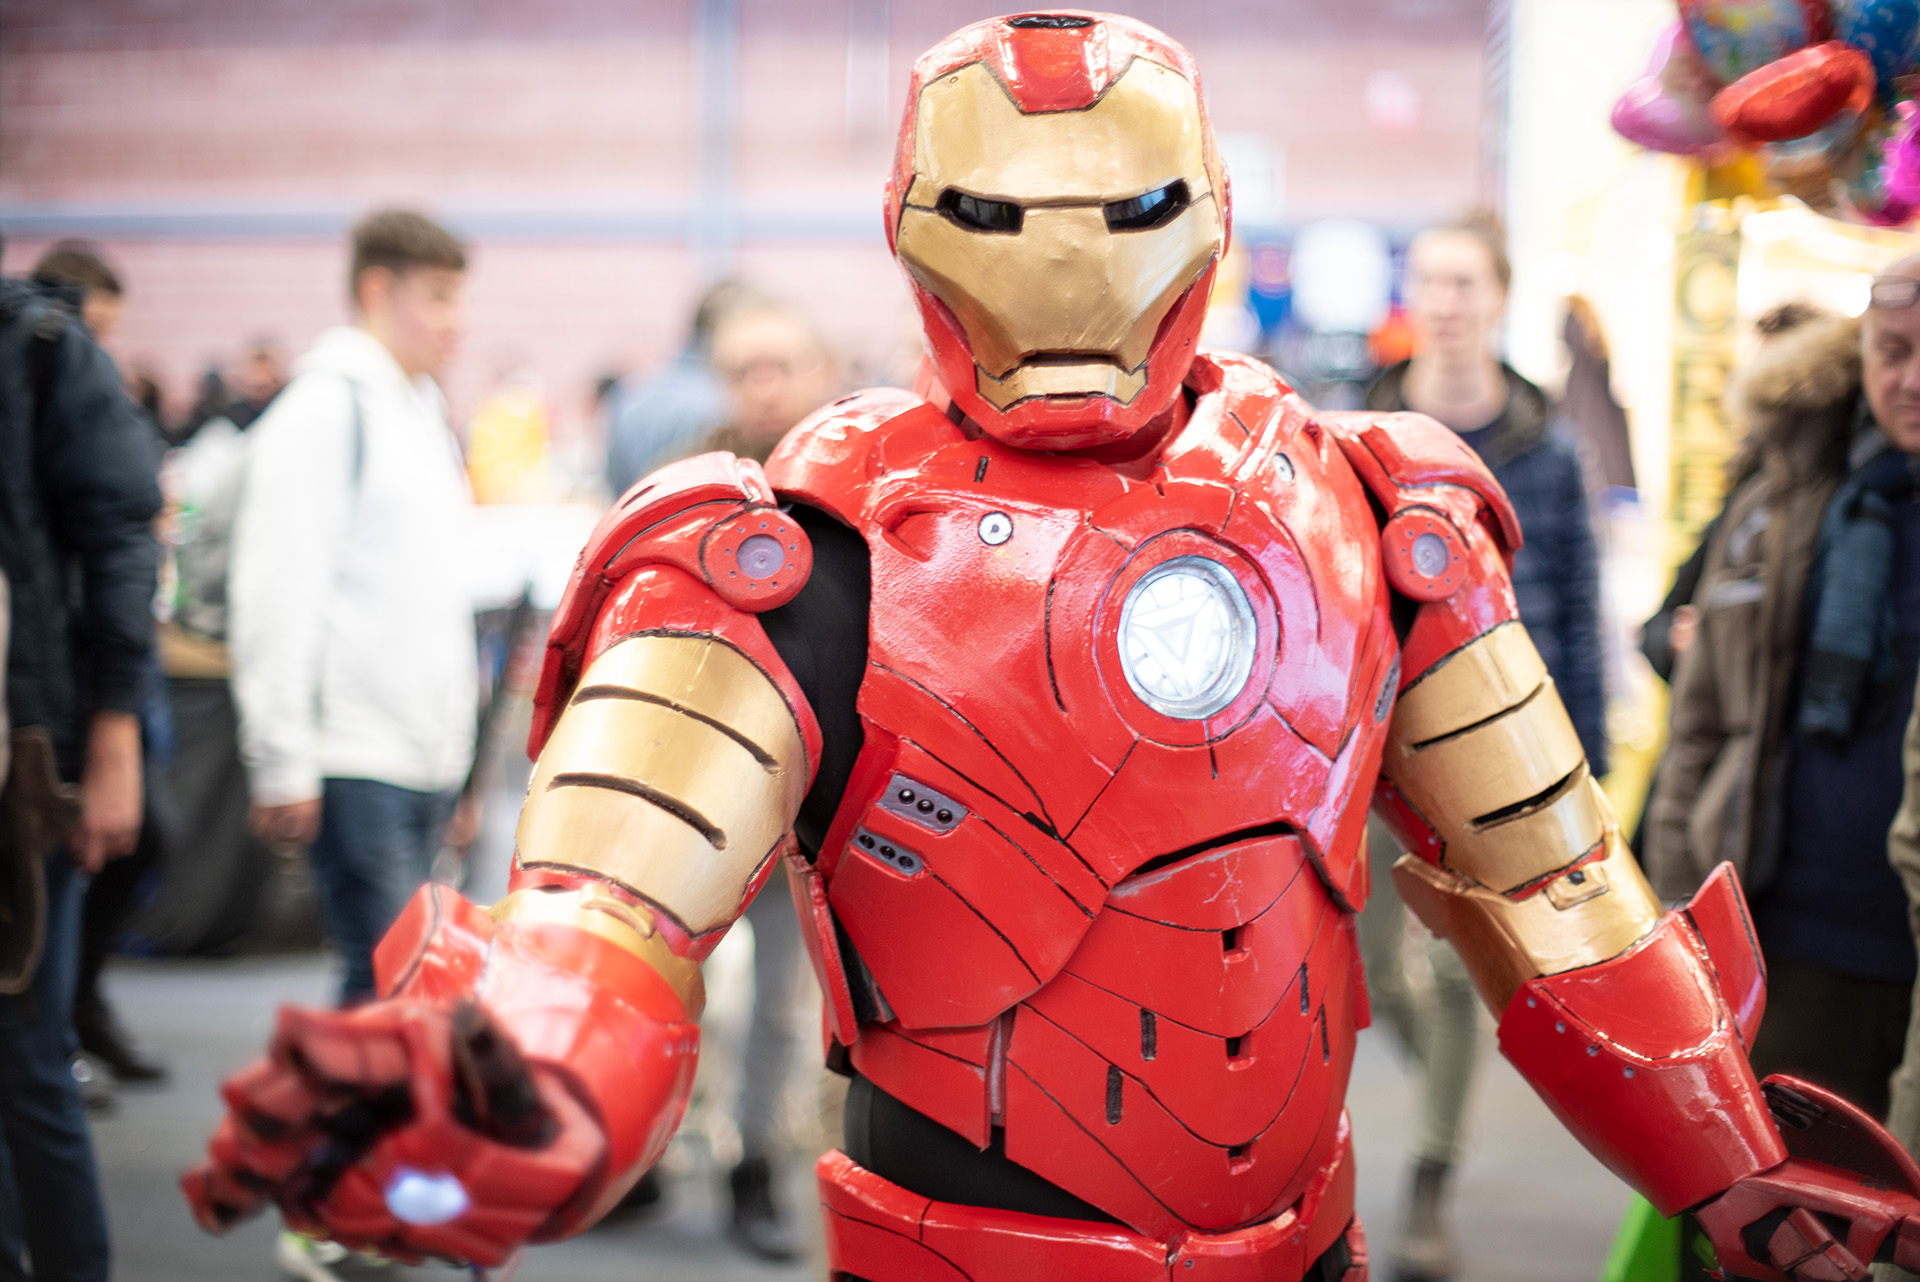 Ironman Cosplay...